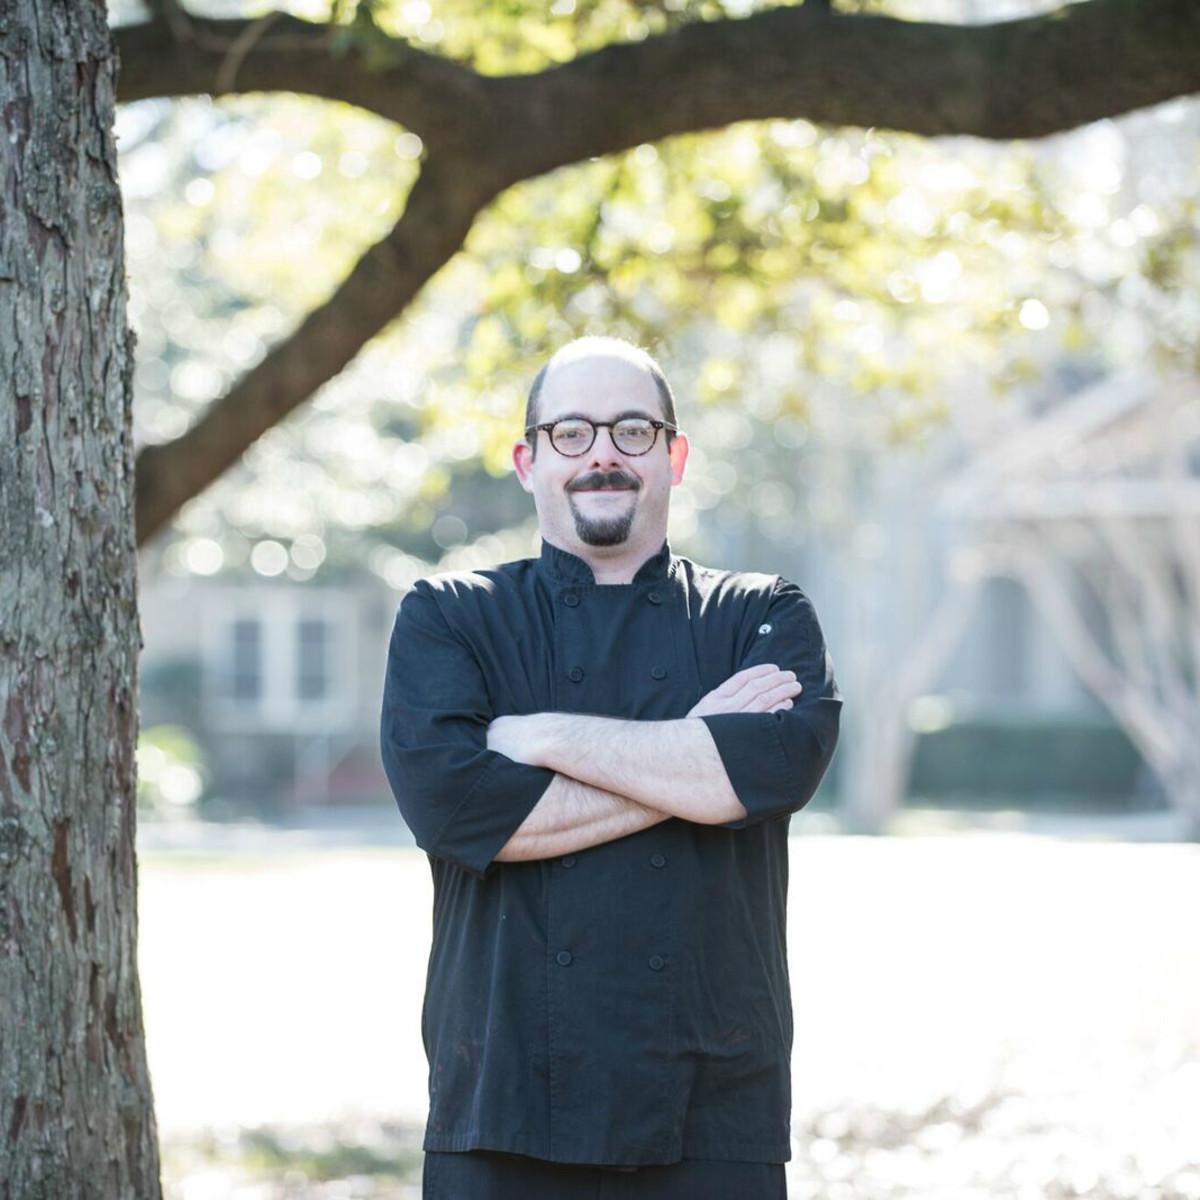 Houston chef Night Heron Jacob Pate